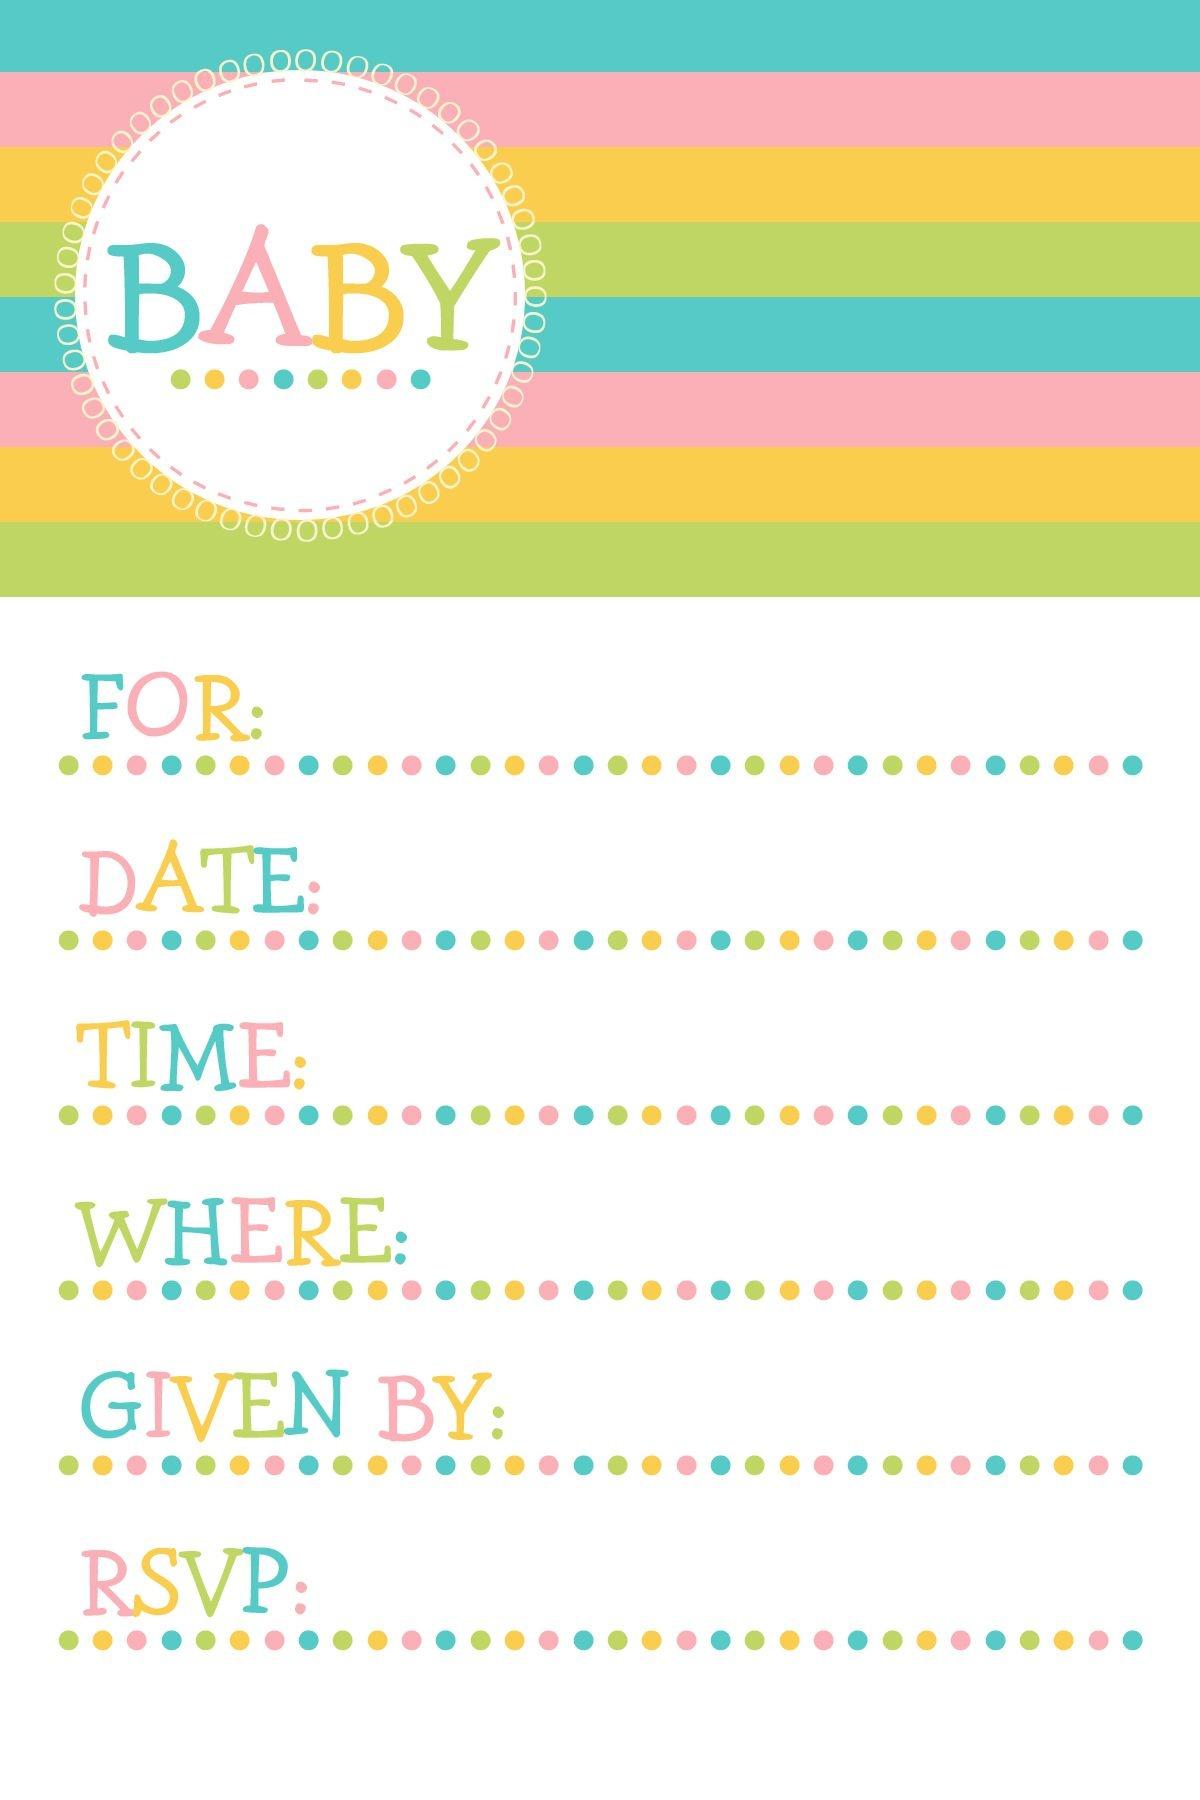 25 Adorable Free Printable Baby Shower Invitations - Free Printable Baby Shower Cards Templates